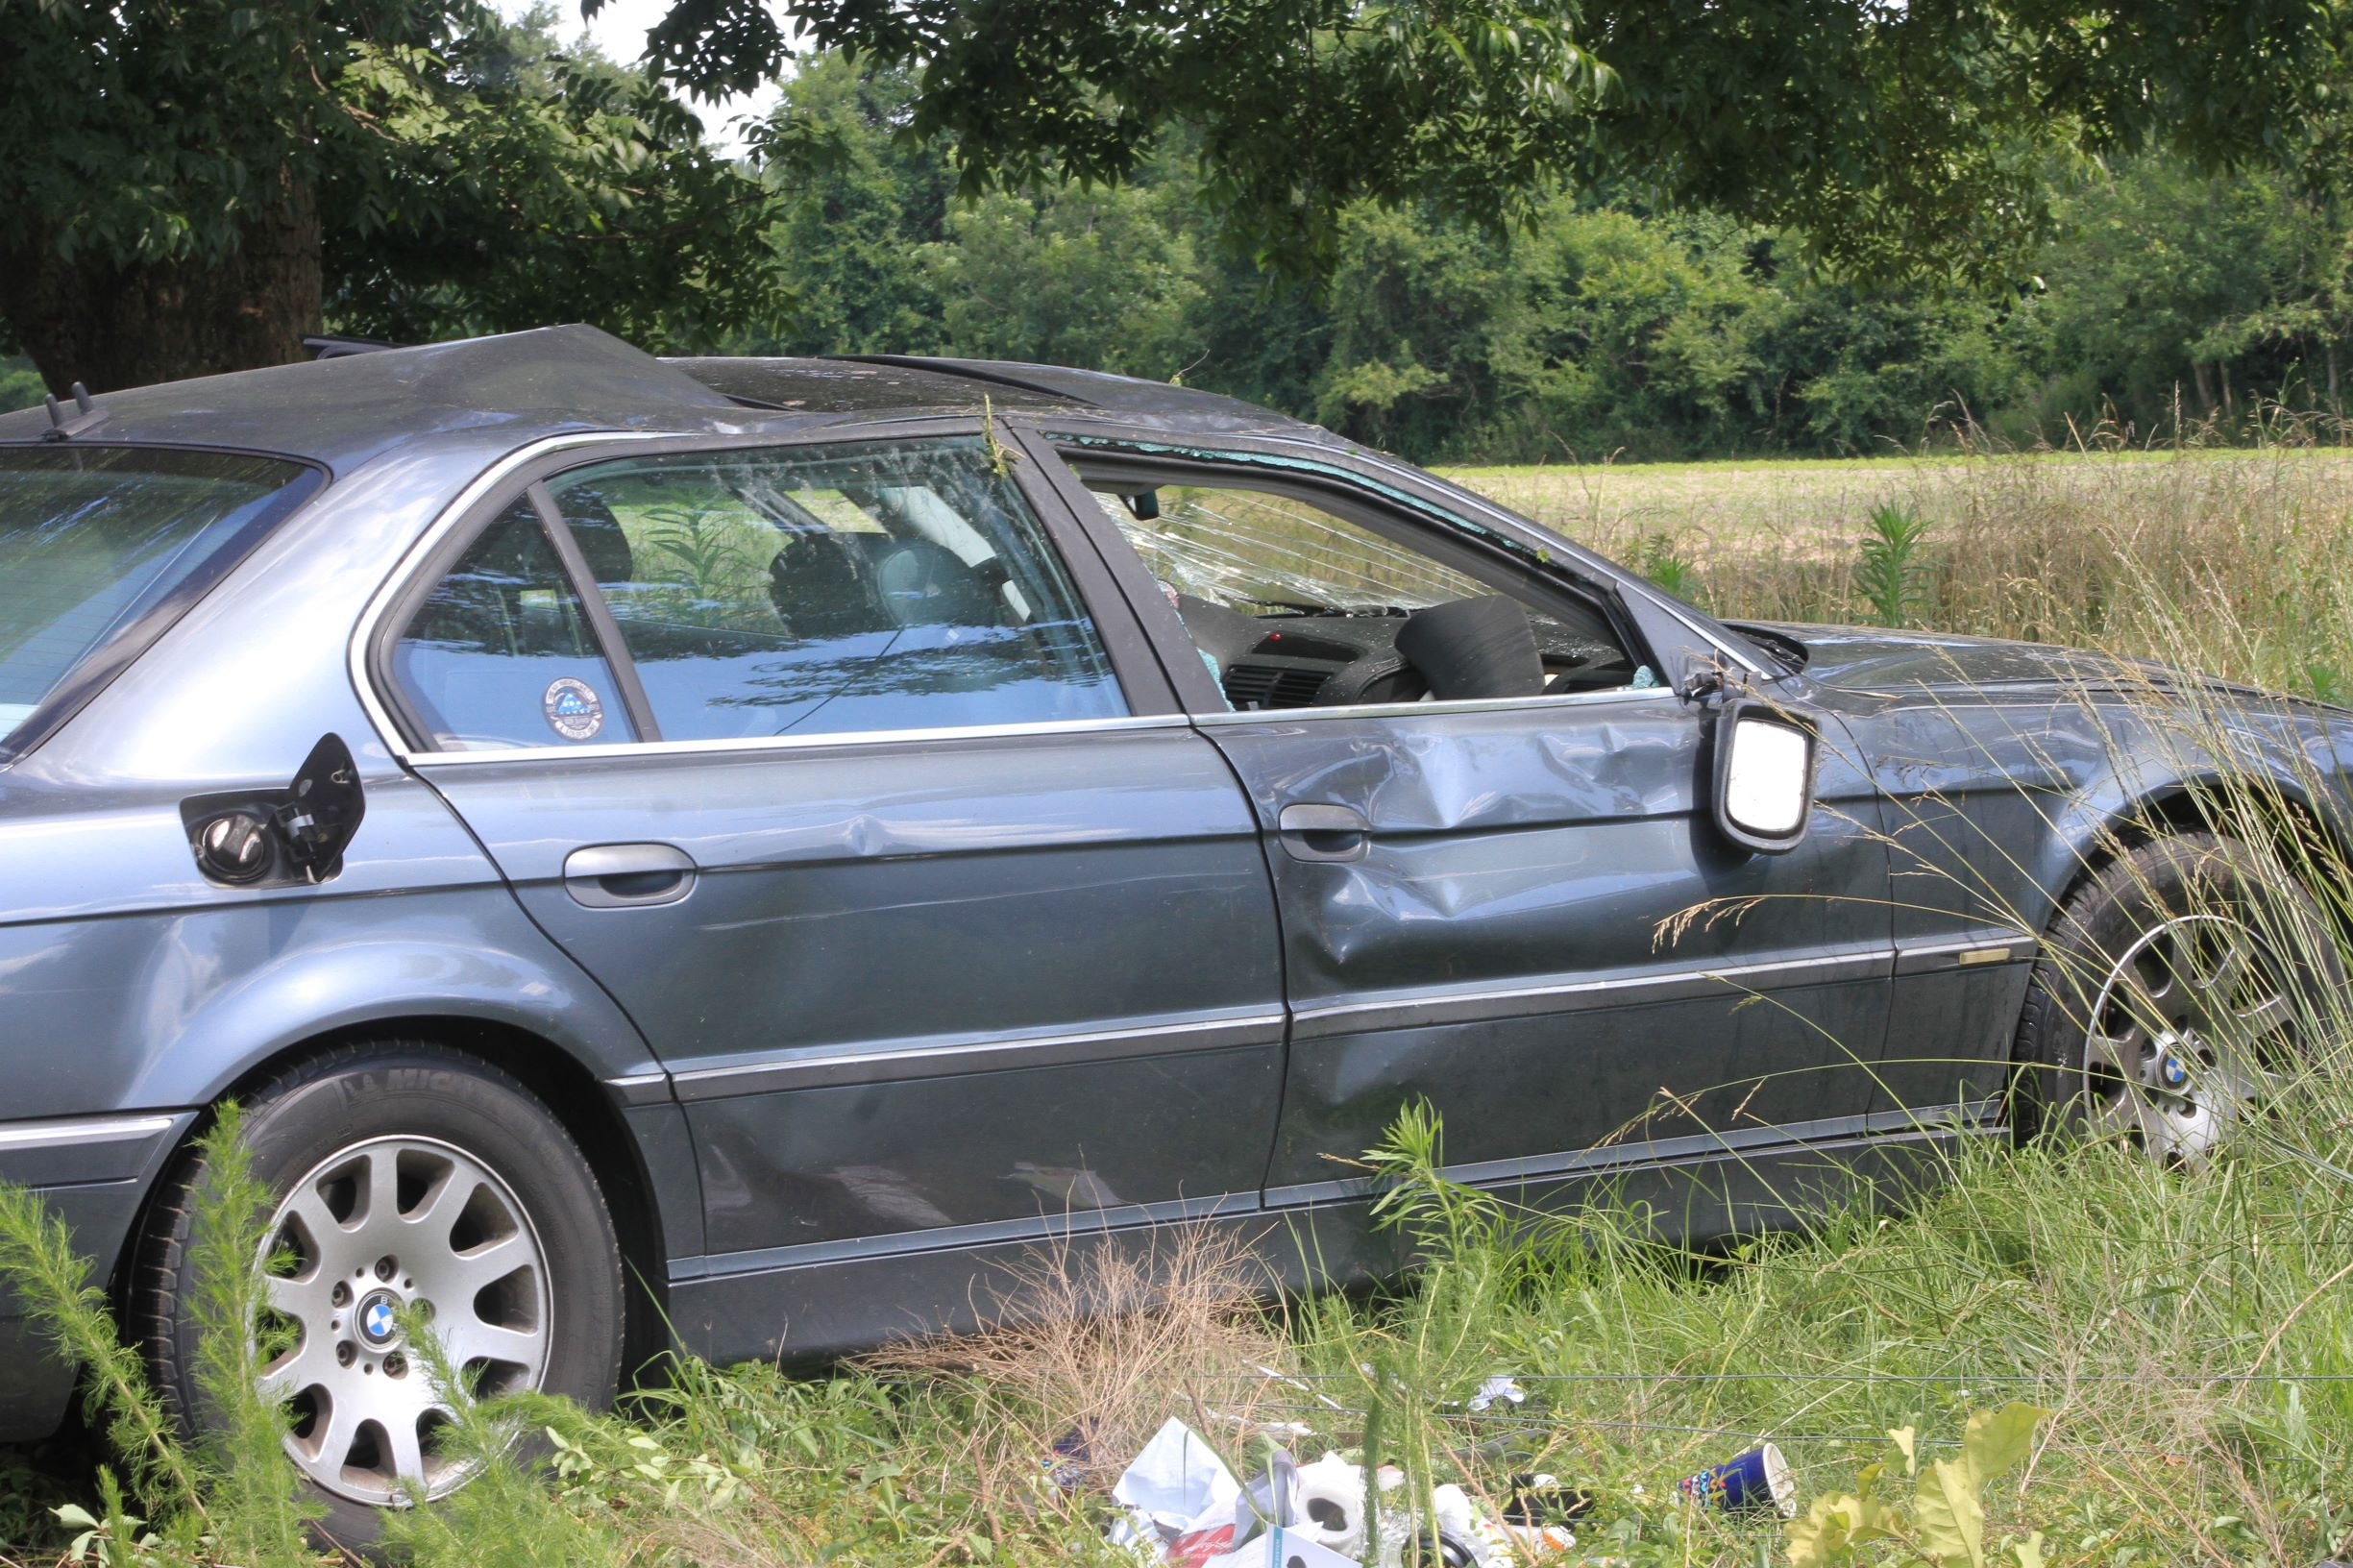 Vehicle Rolls, Lands In Field (PHOTOS)